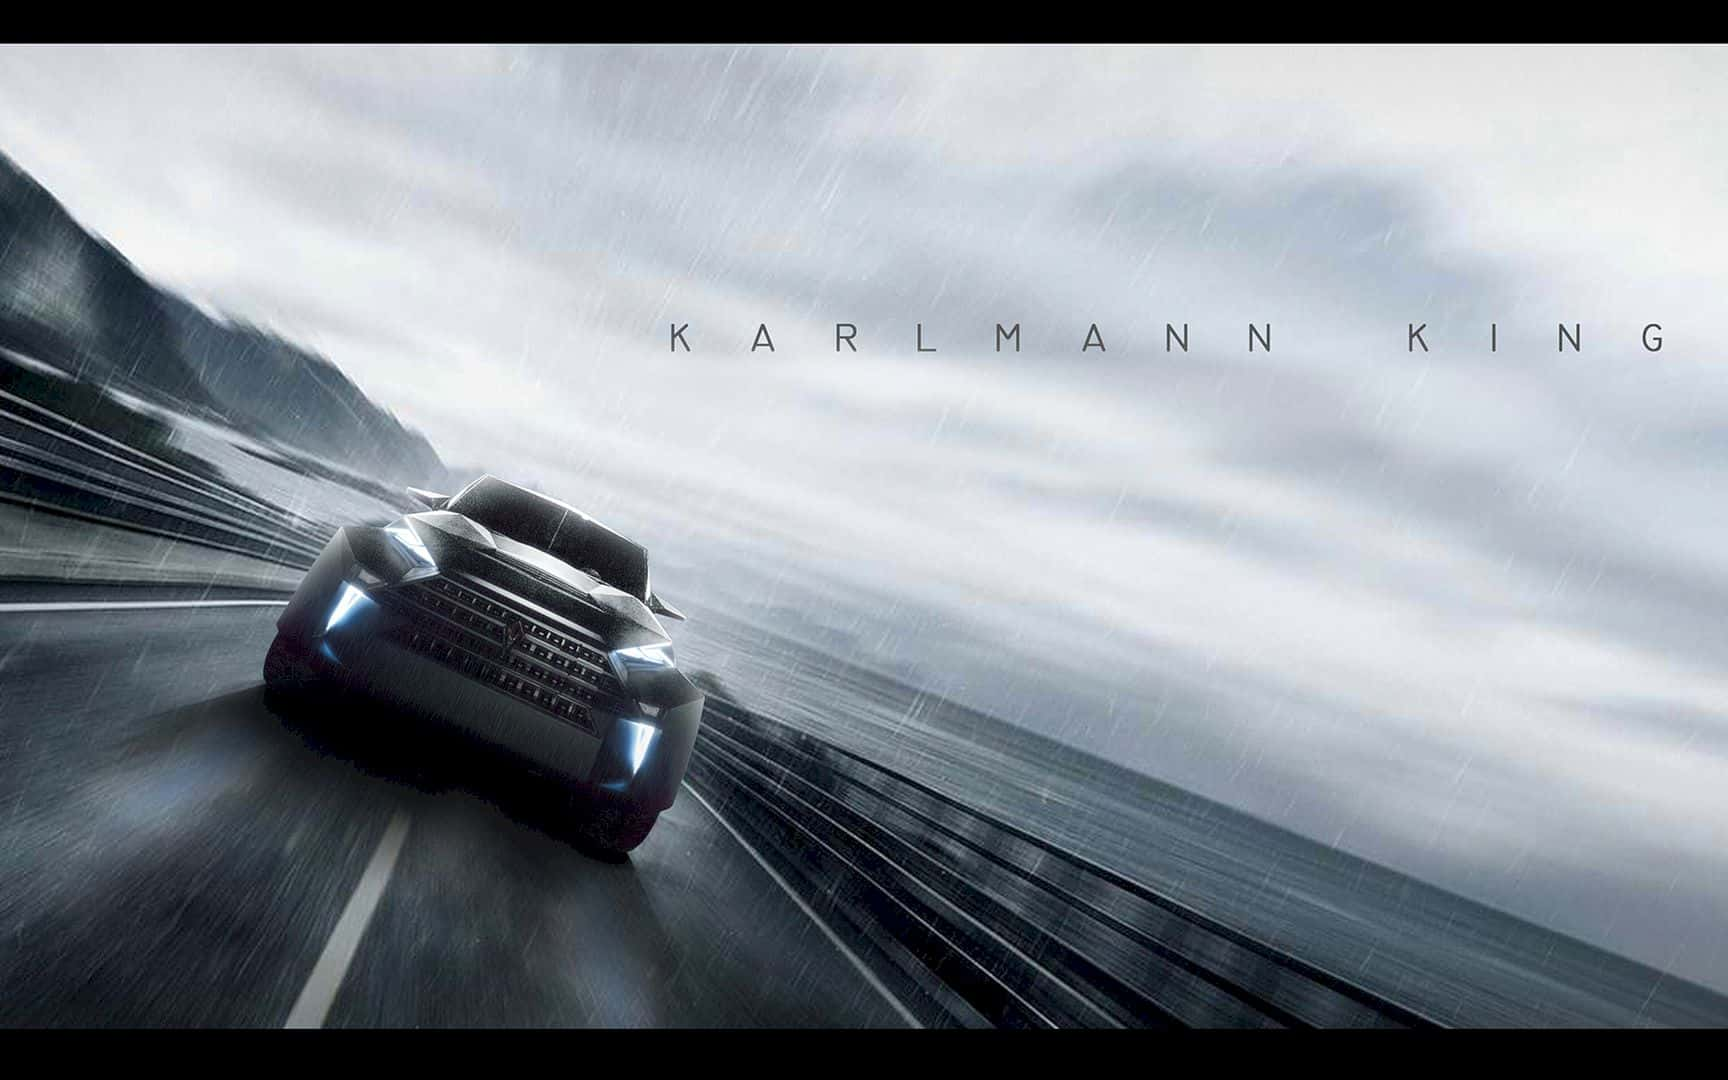 Karlmann King 6